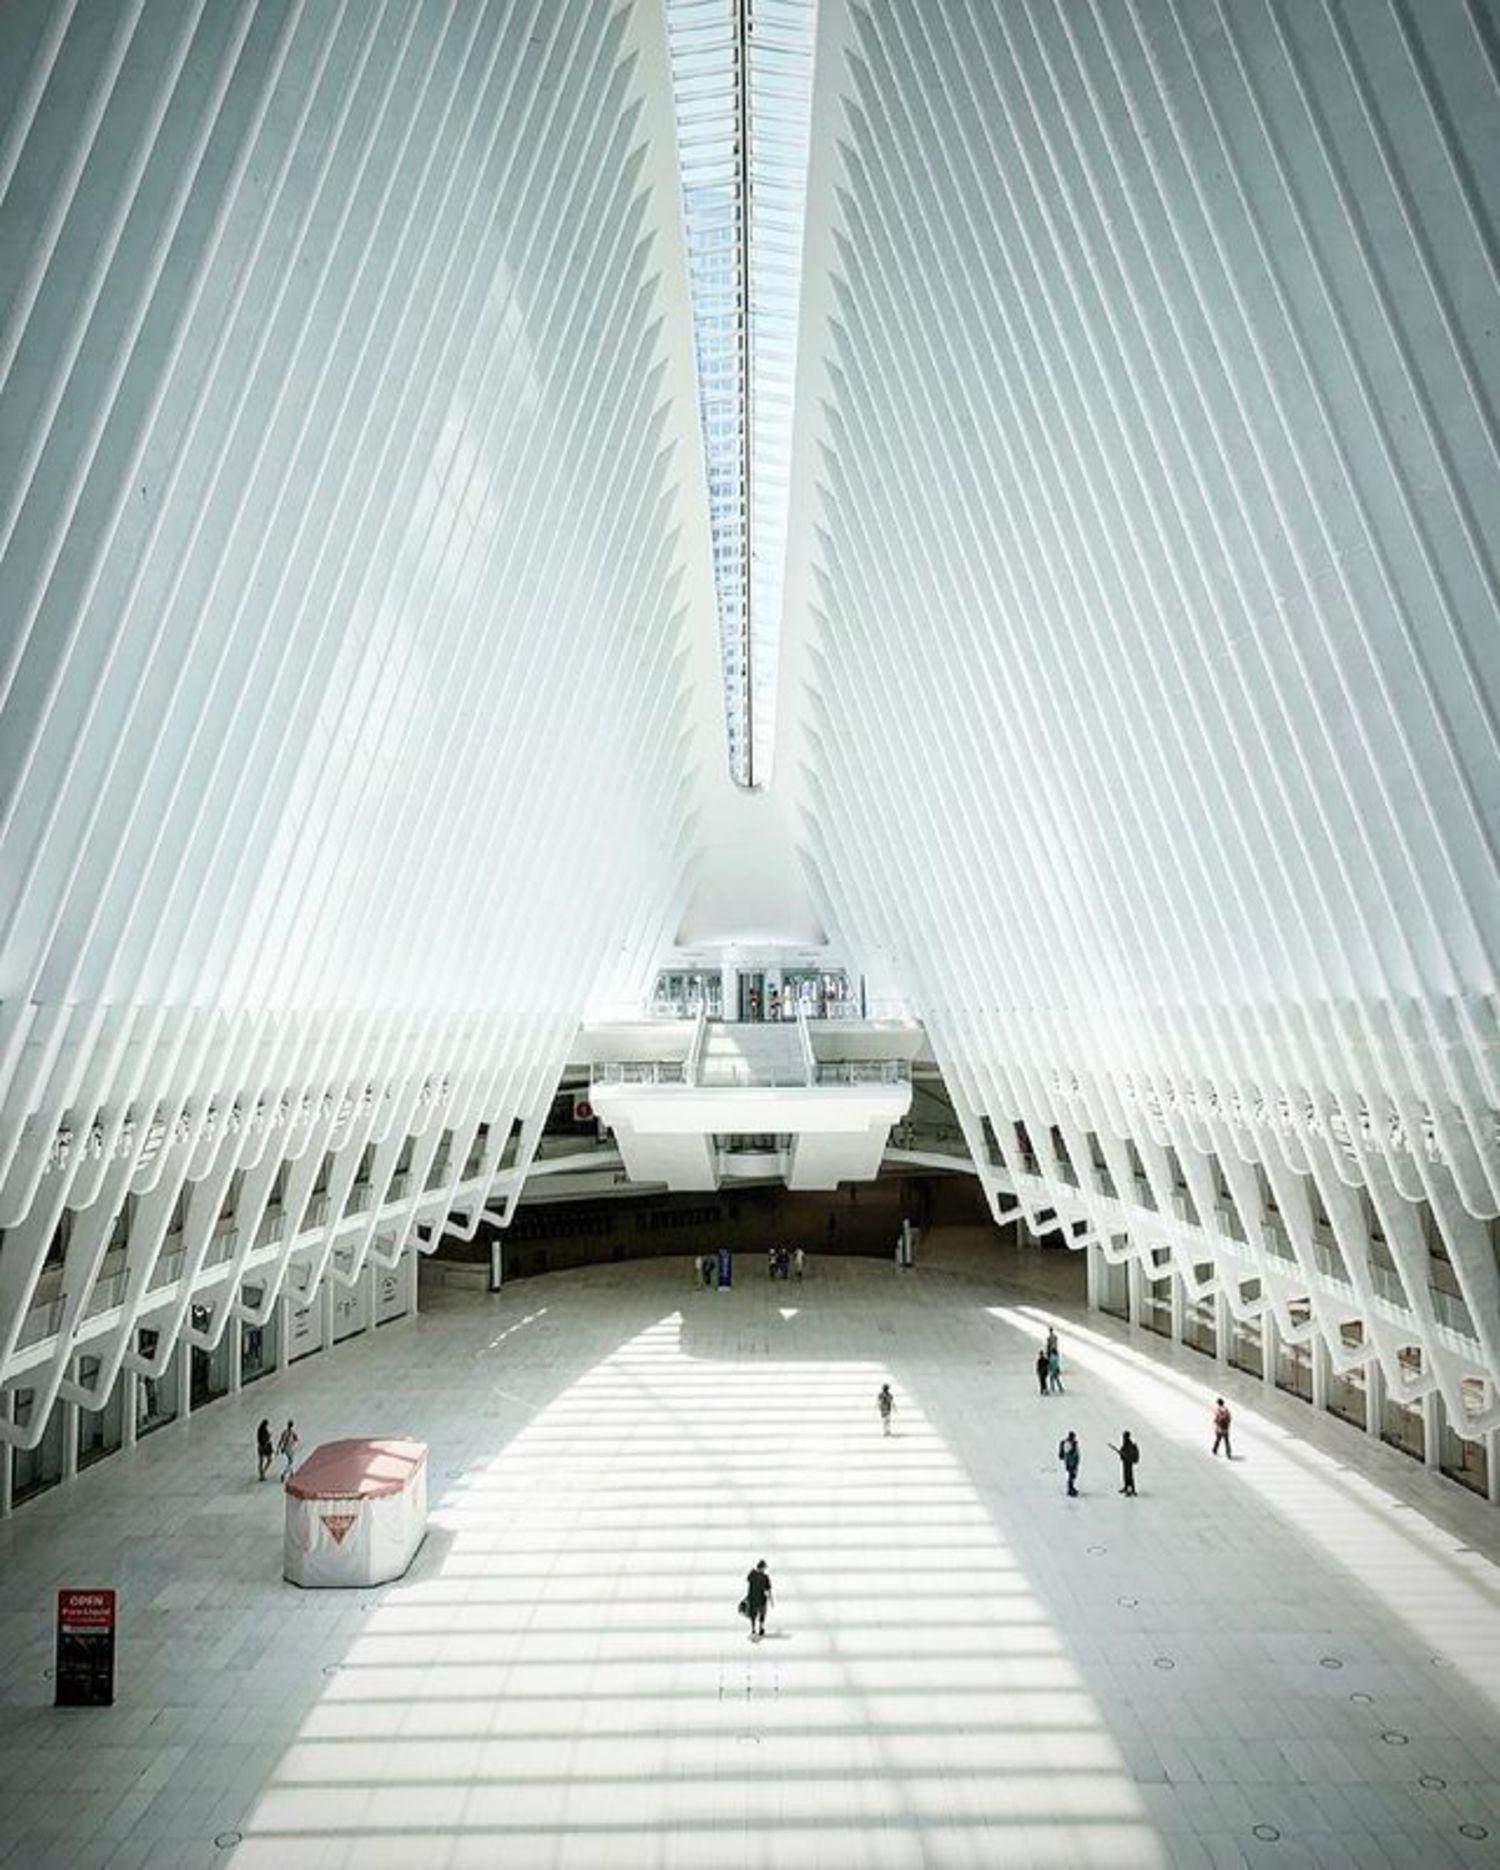 World Trade Center Oculus, Financial District, Manhattan